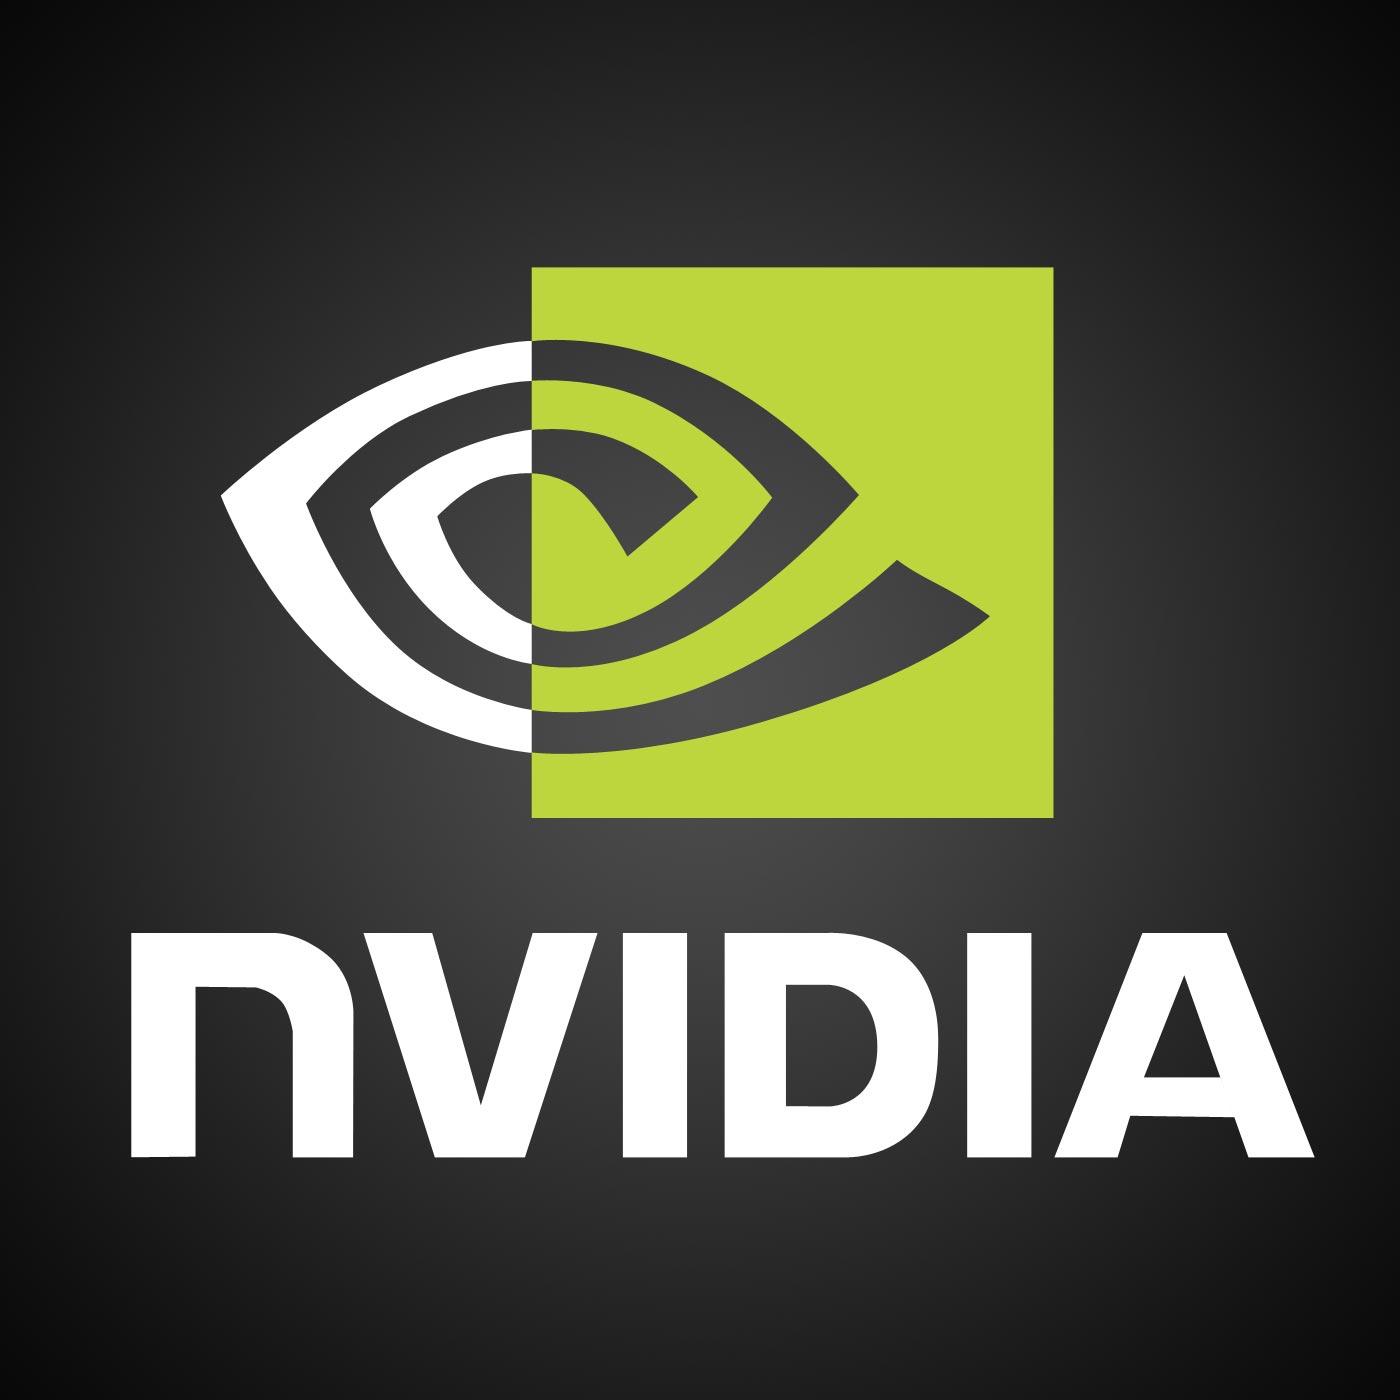 nvidia,nvidia drivers,nvidia geforce,drivers,تحميل برنامج nvidia geforce,حل مشكلة برنامج nvidia geforce,geforce,nvidia geforce graphic driver,nvidia geforce gtx 780m driver,geforce drivers,تحميل برنامج nvidia,nvidia geforce driver -384.76-whgl for win10 x64,تحميل برنامج nvidia 2016,geforce now review,geforce experience,device driver (software genre)